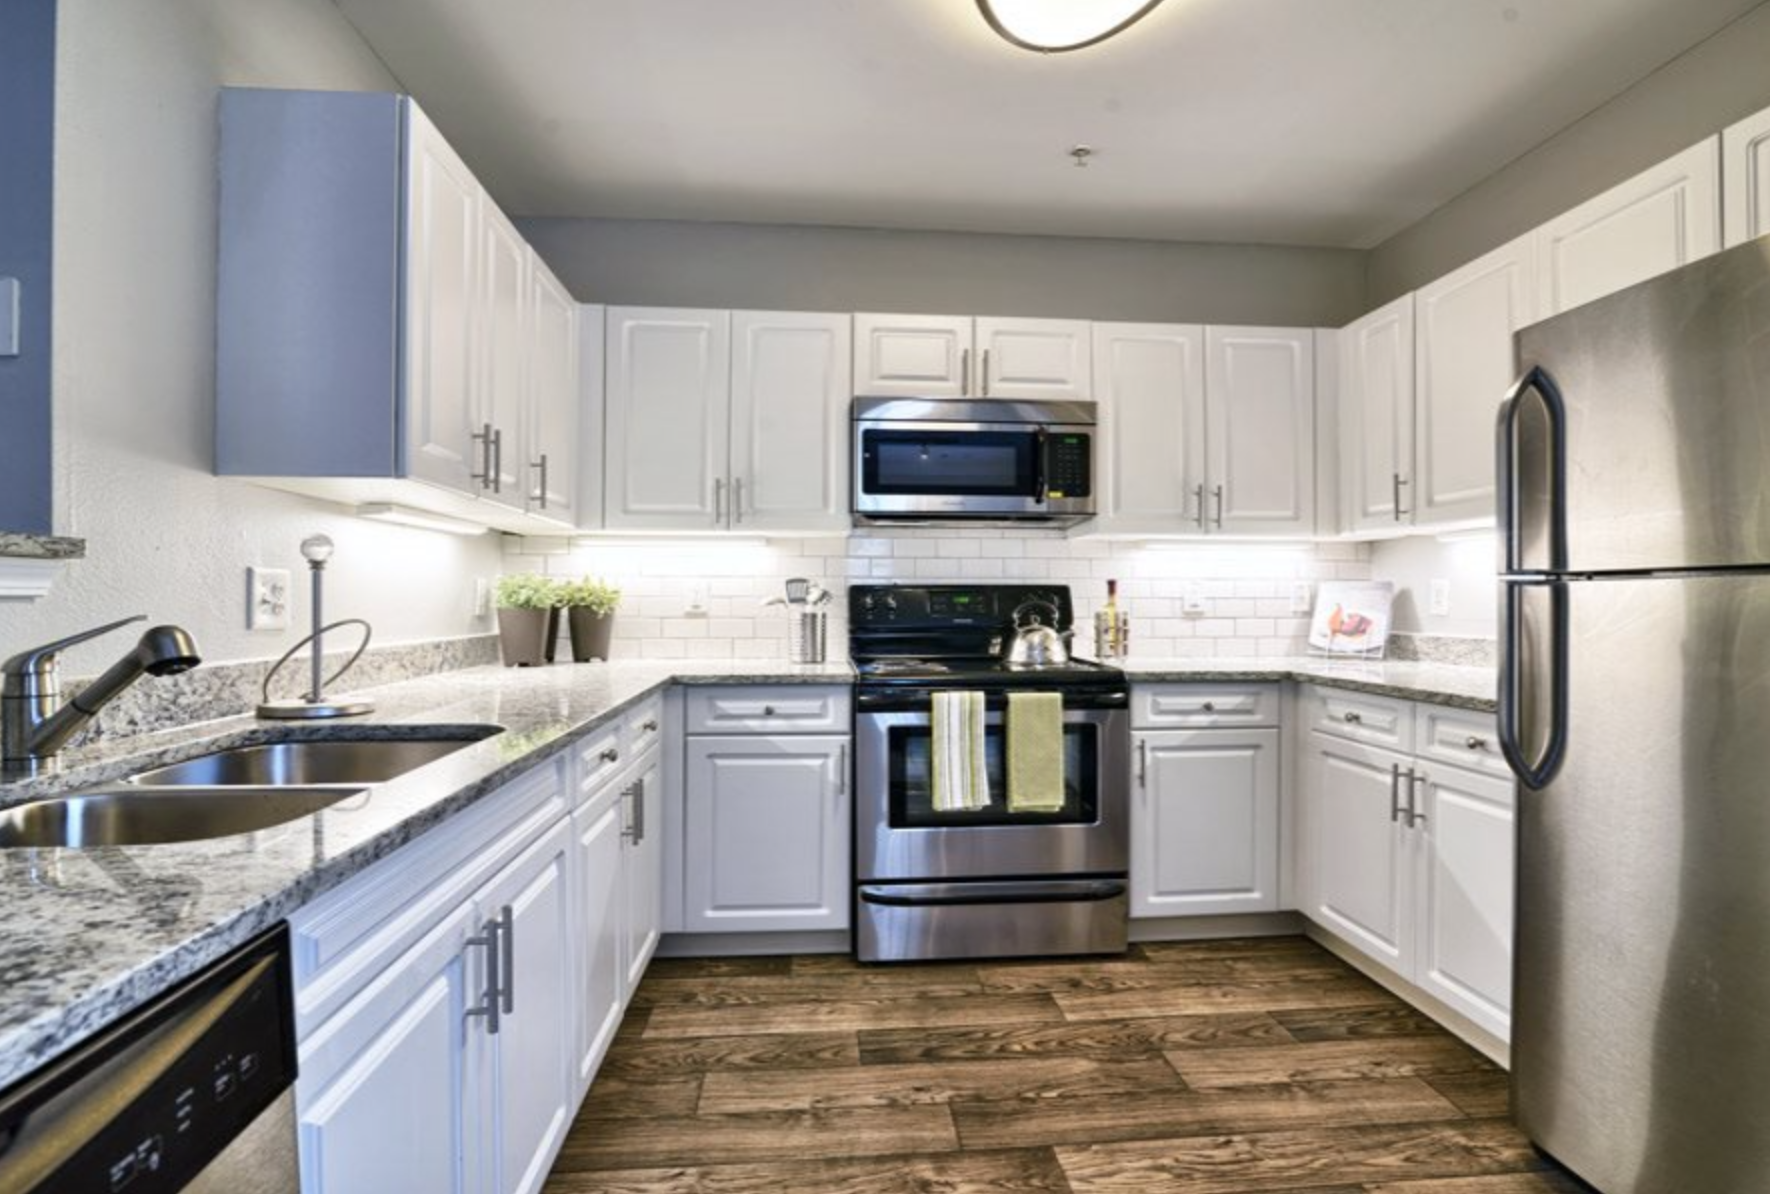 19 - Unit Kitchen Remodeled 2